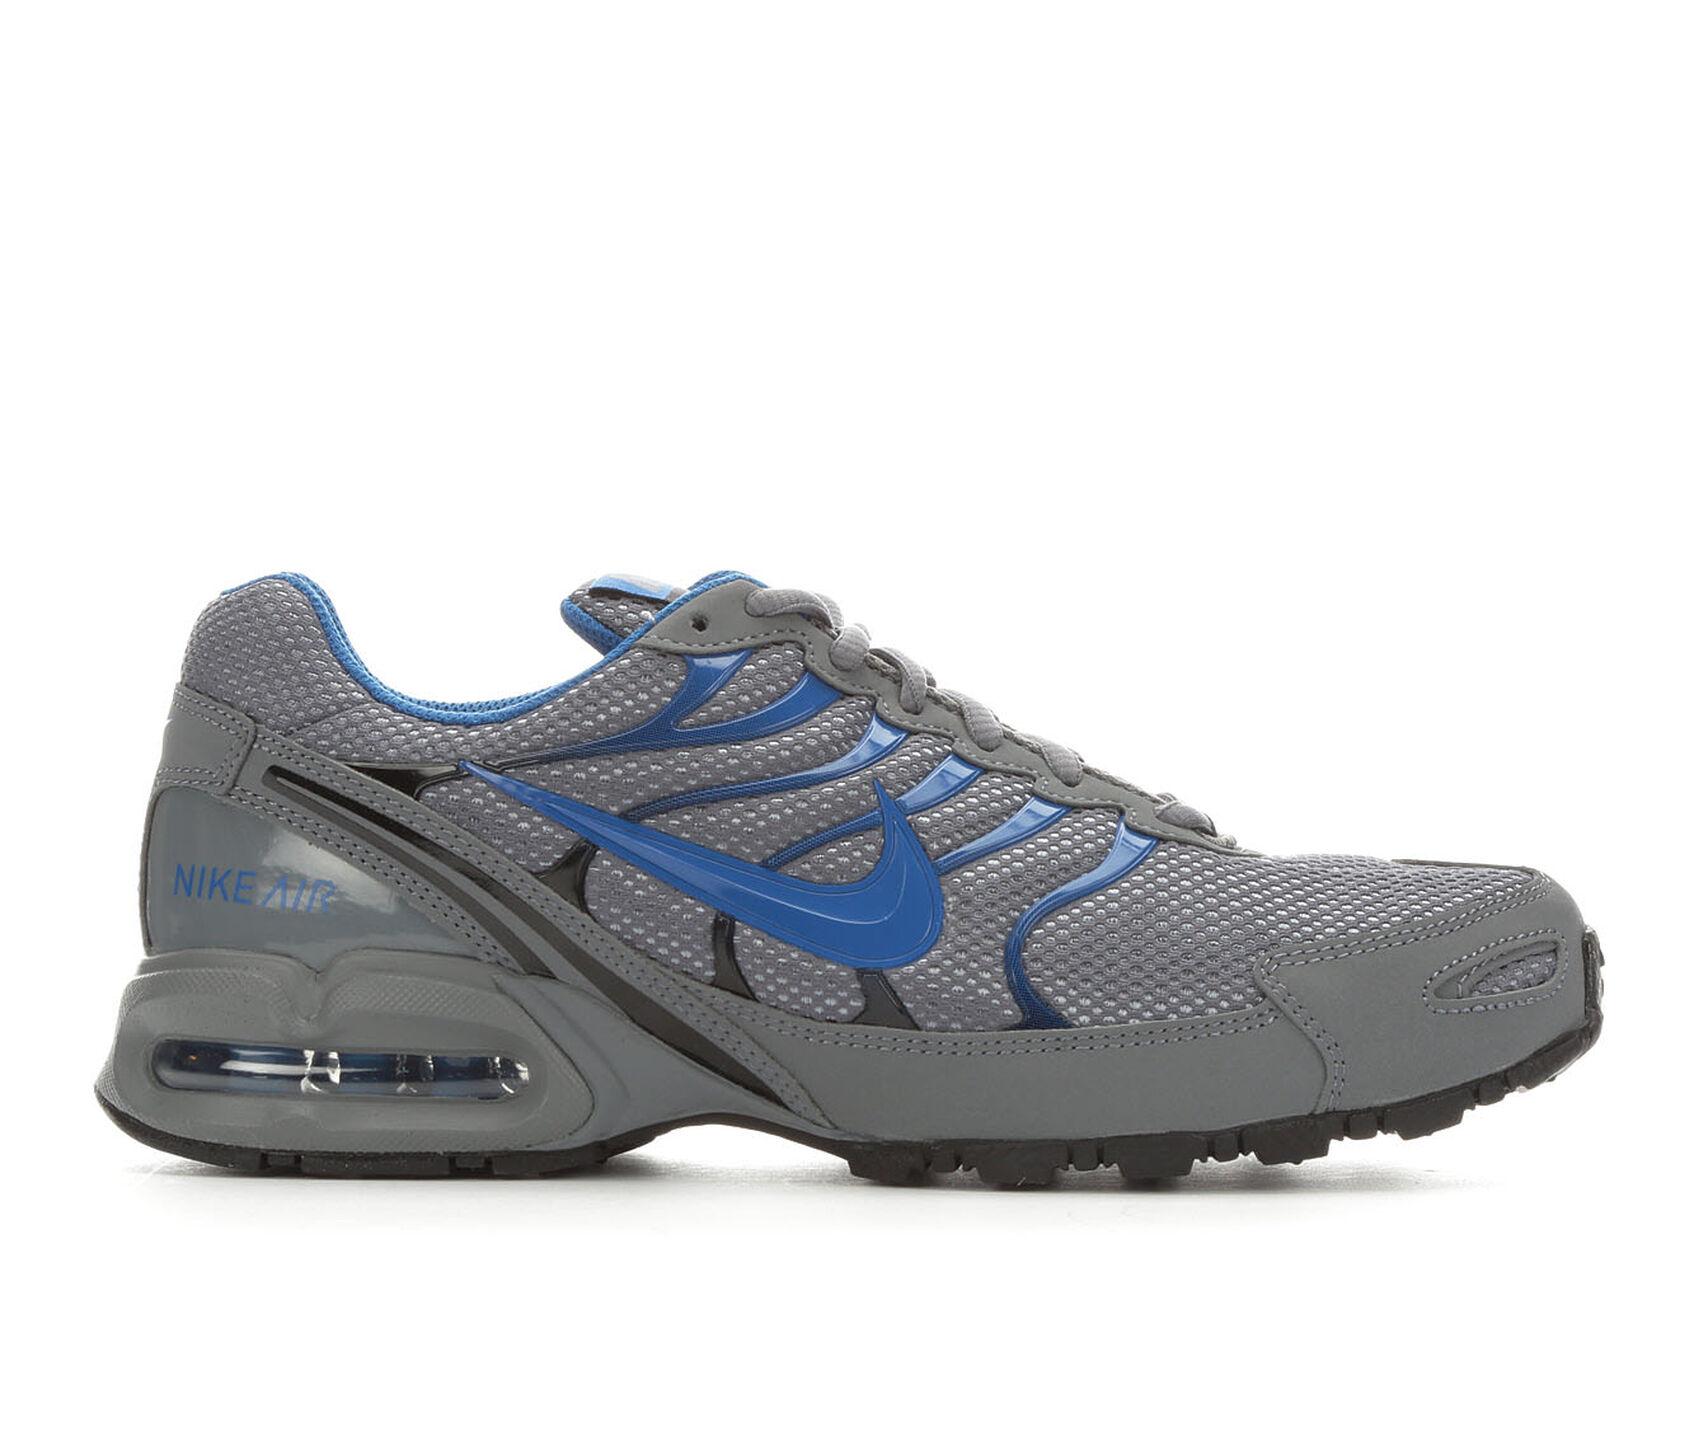 2bc623677b4 ... Nike Air Max Torch 4 Running Shoes. Previous